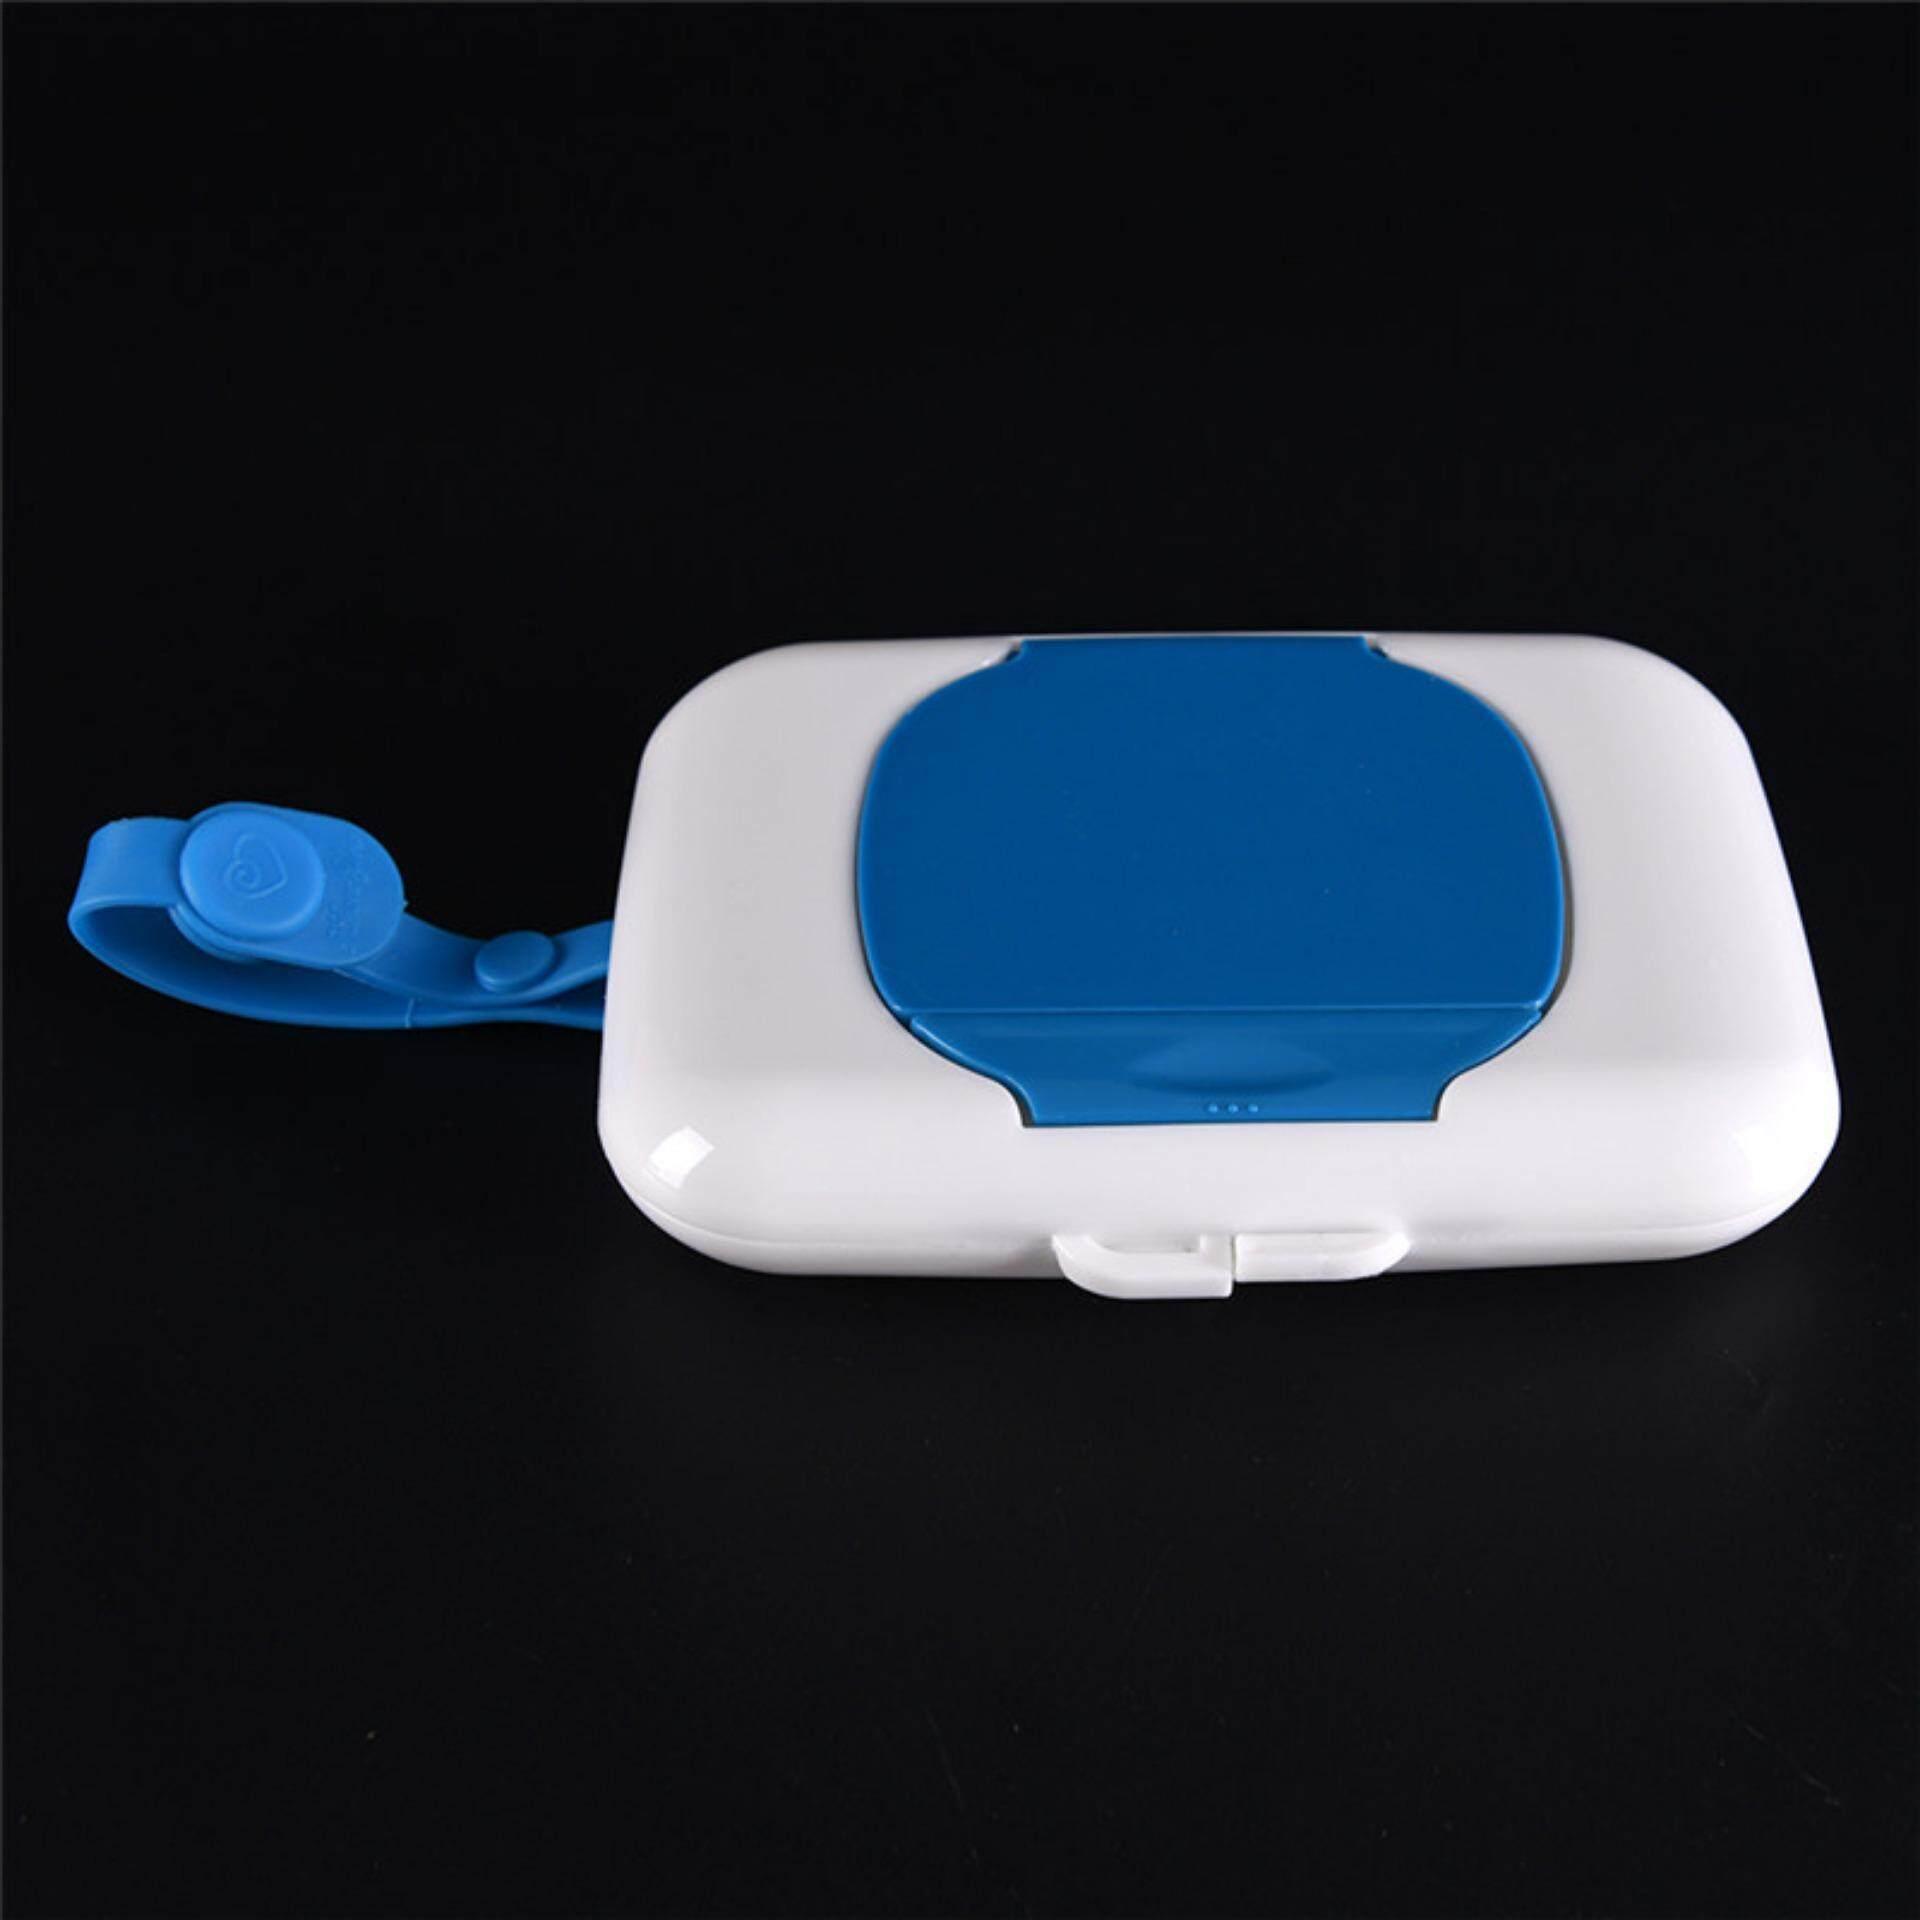 Baby Travel Wipe Case Child Wet Wipes Box Changing Dispenser Storage Holder Blue - Intl By A Mango.